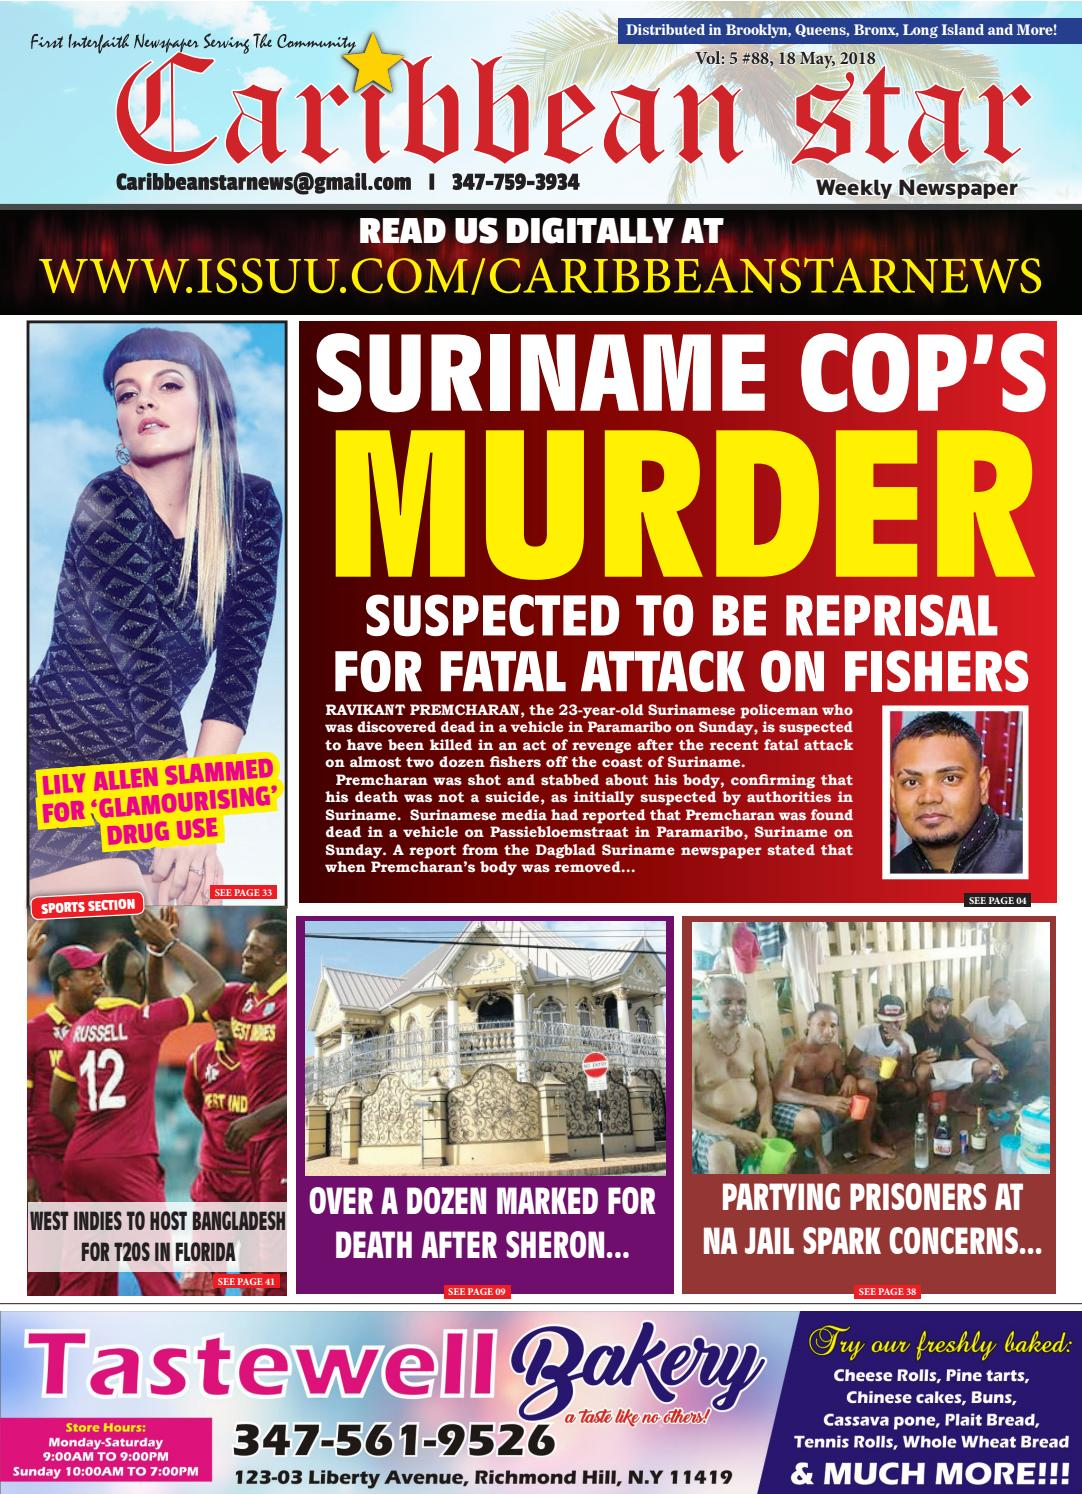 Caribbean star 18 may 2018 epaper by Caribbean Star News - issuu